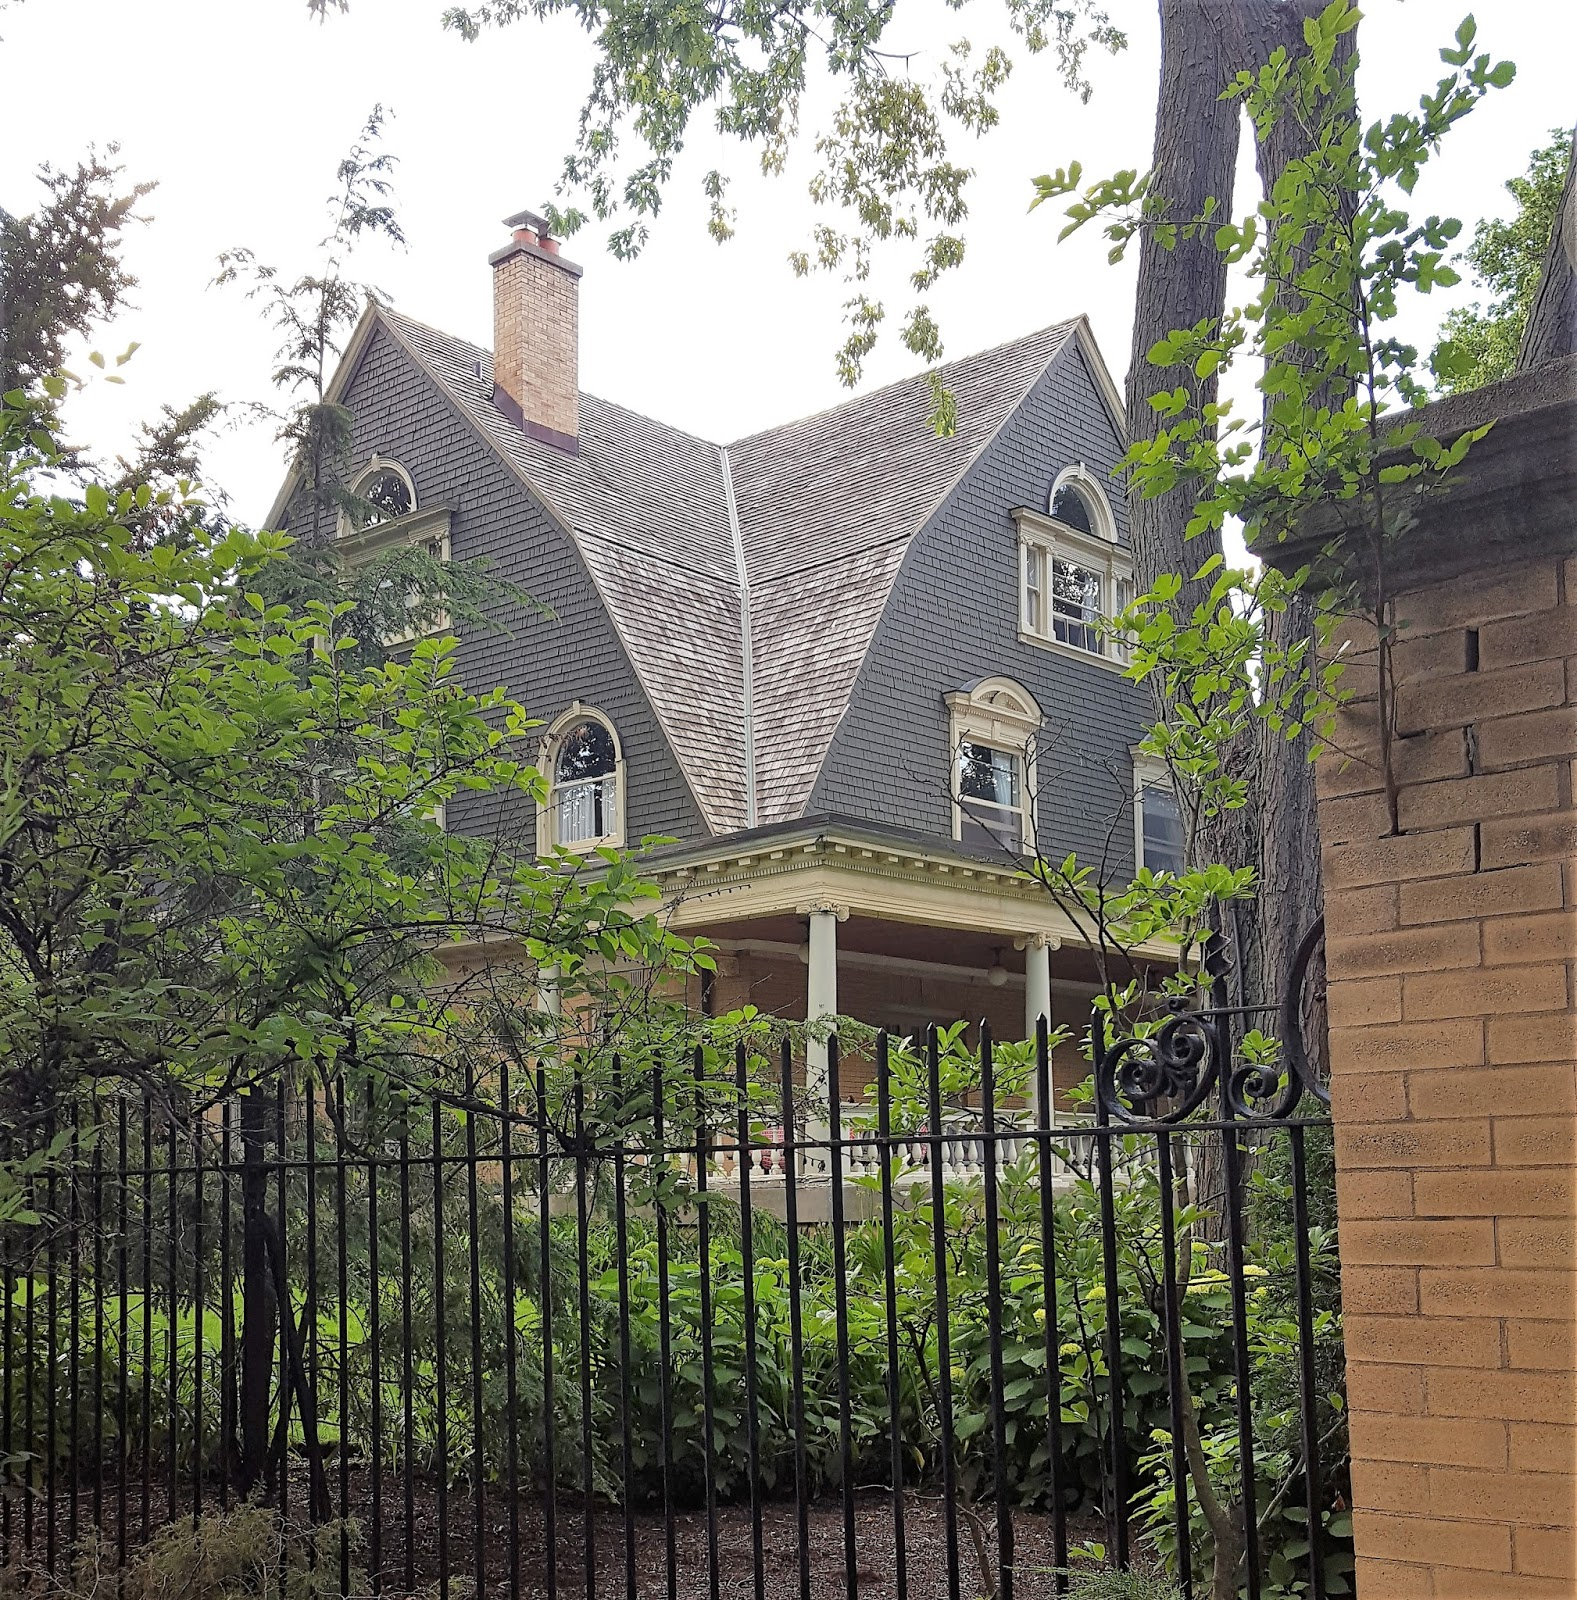 COMFY HOUSE